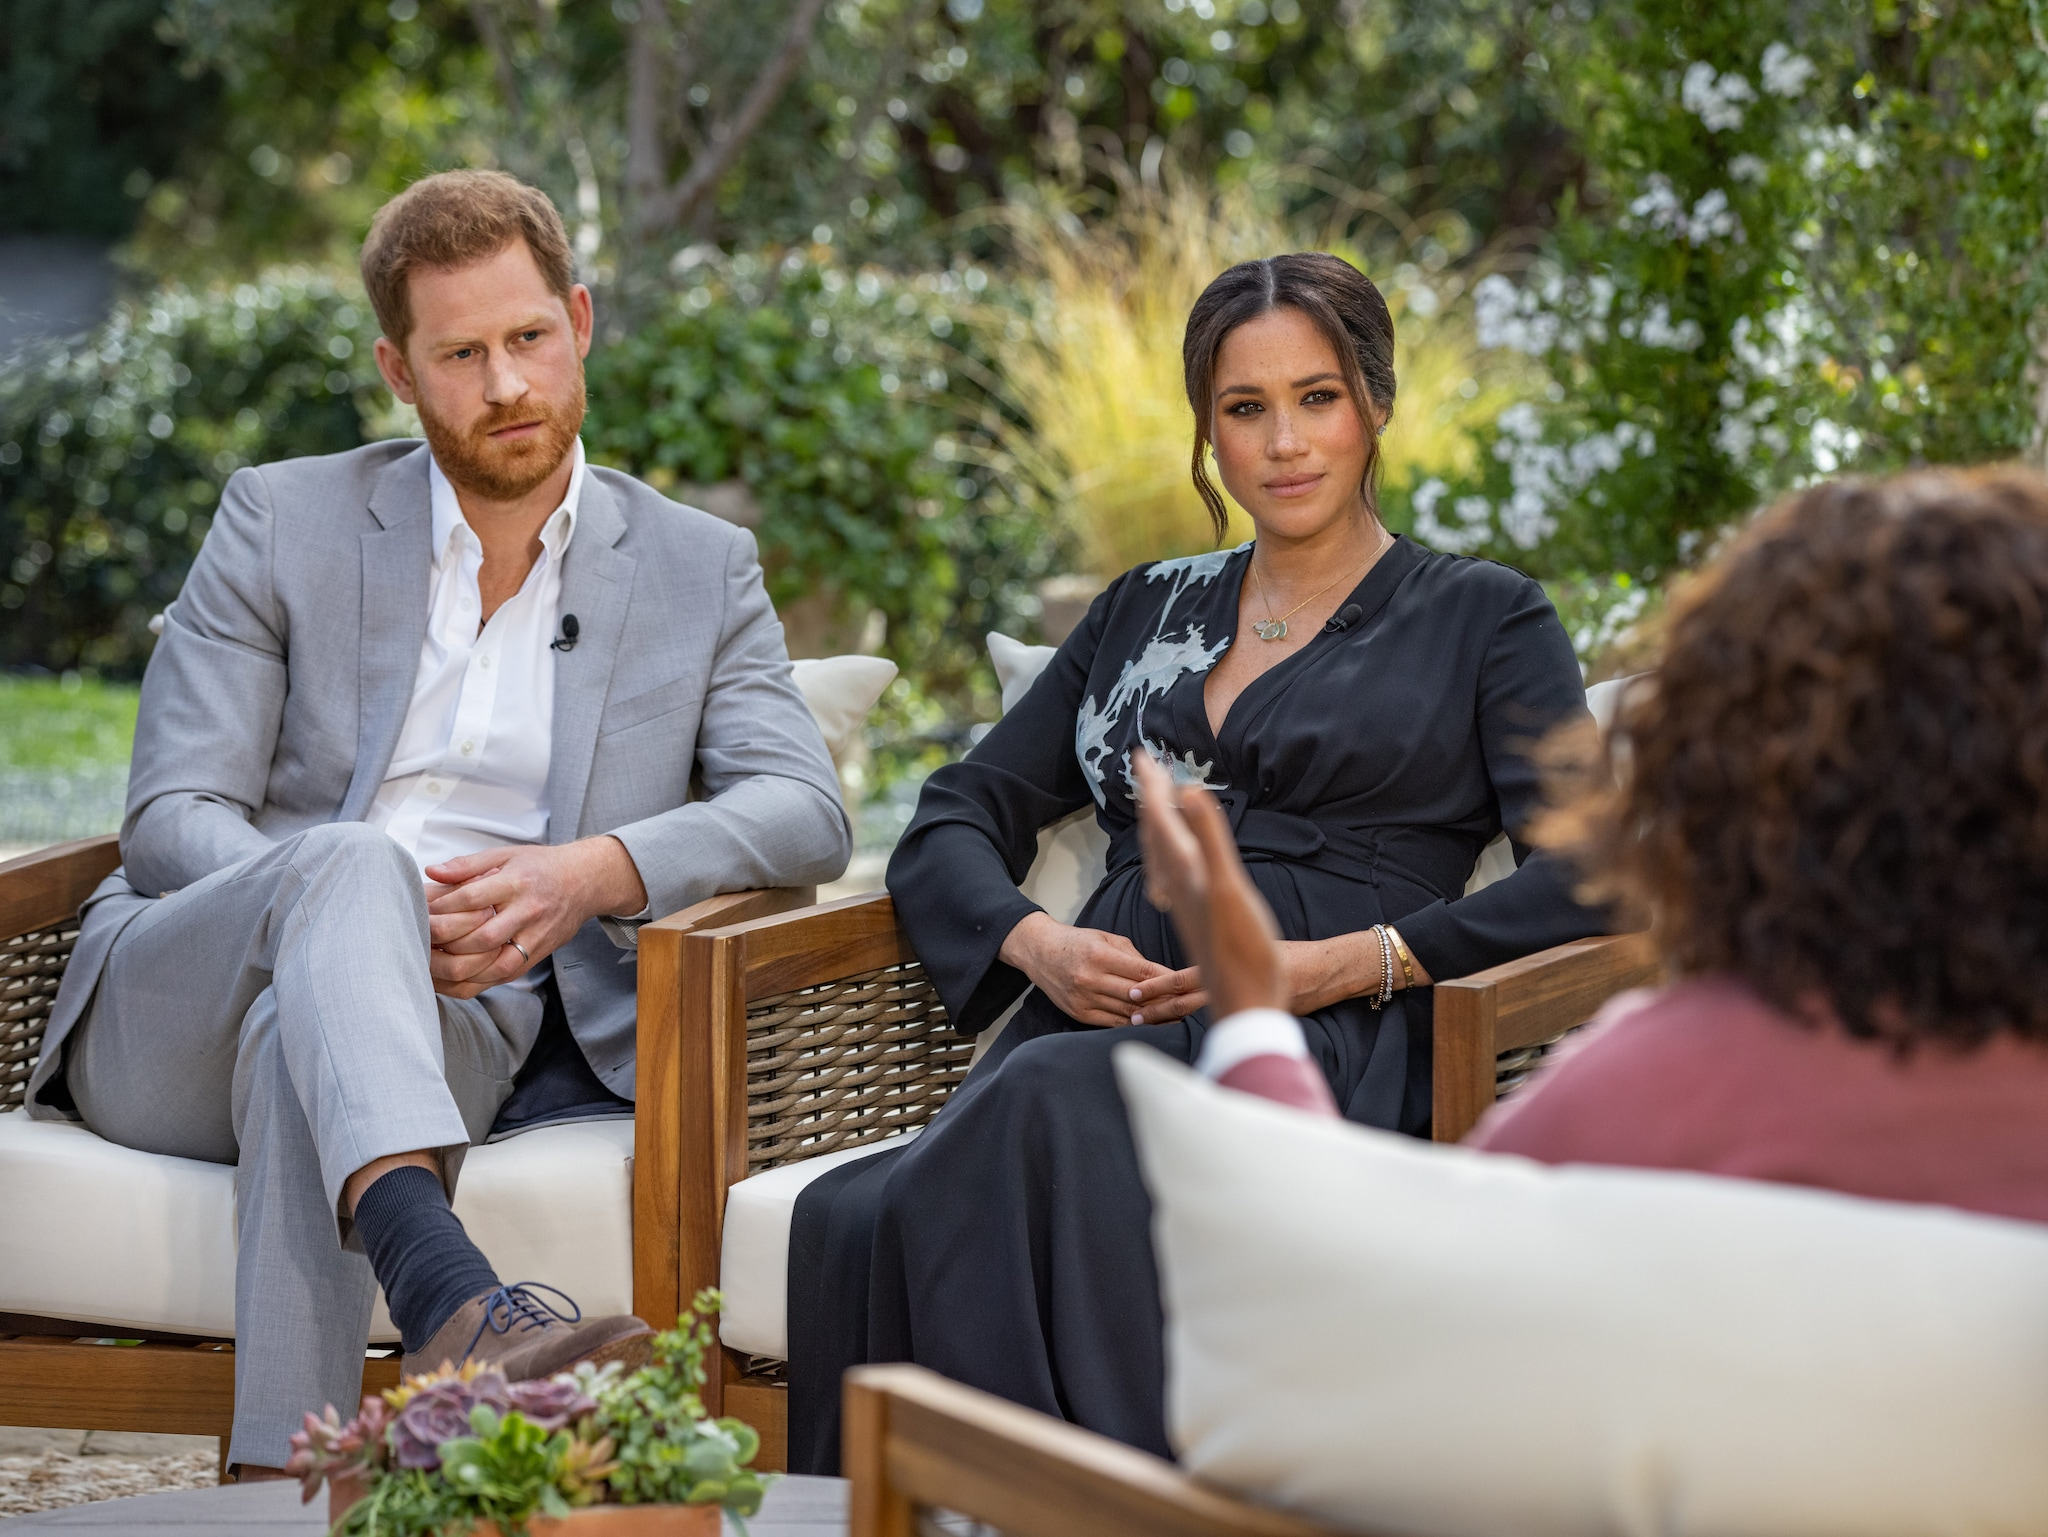 Meghan, Harry e la nuova vita lontani dai Royals